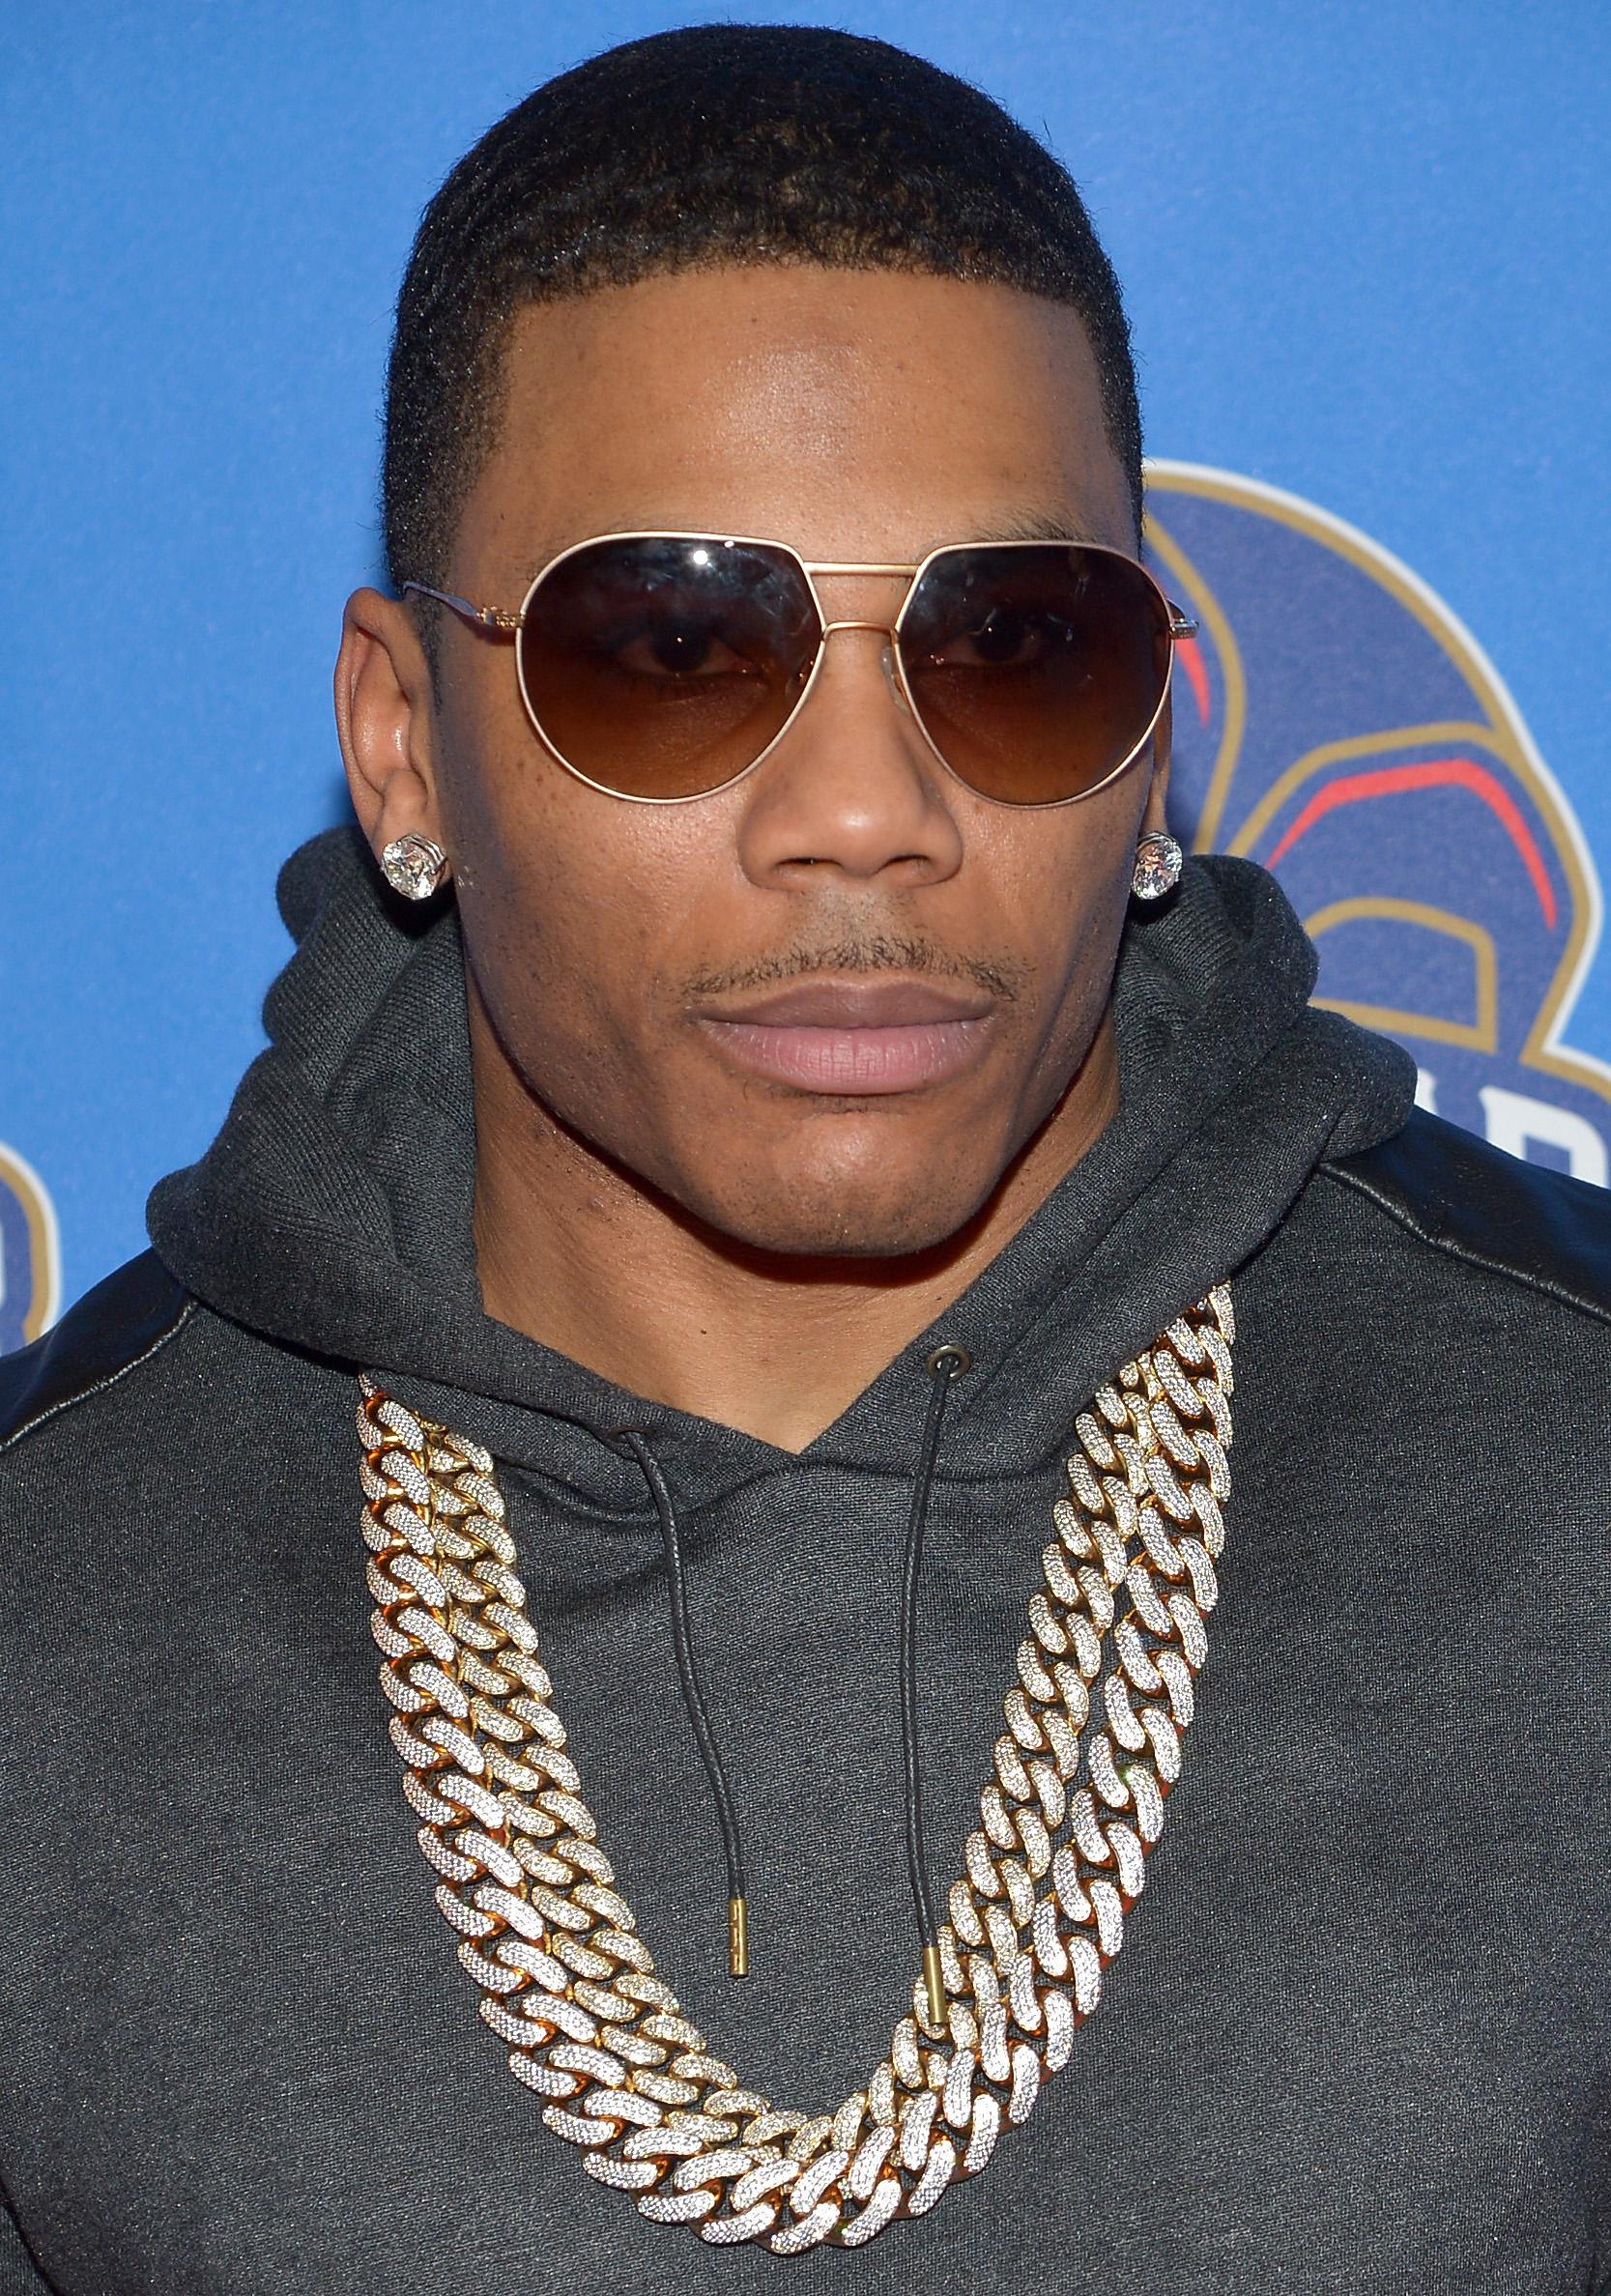 Hot In Herre! Nelly Celebrates His Birthday Naked [PHOTO]